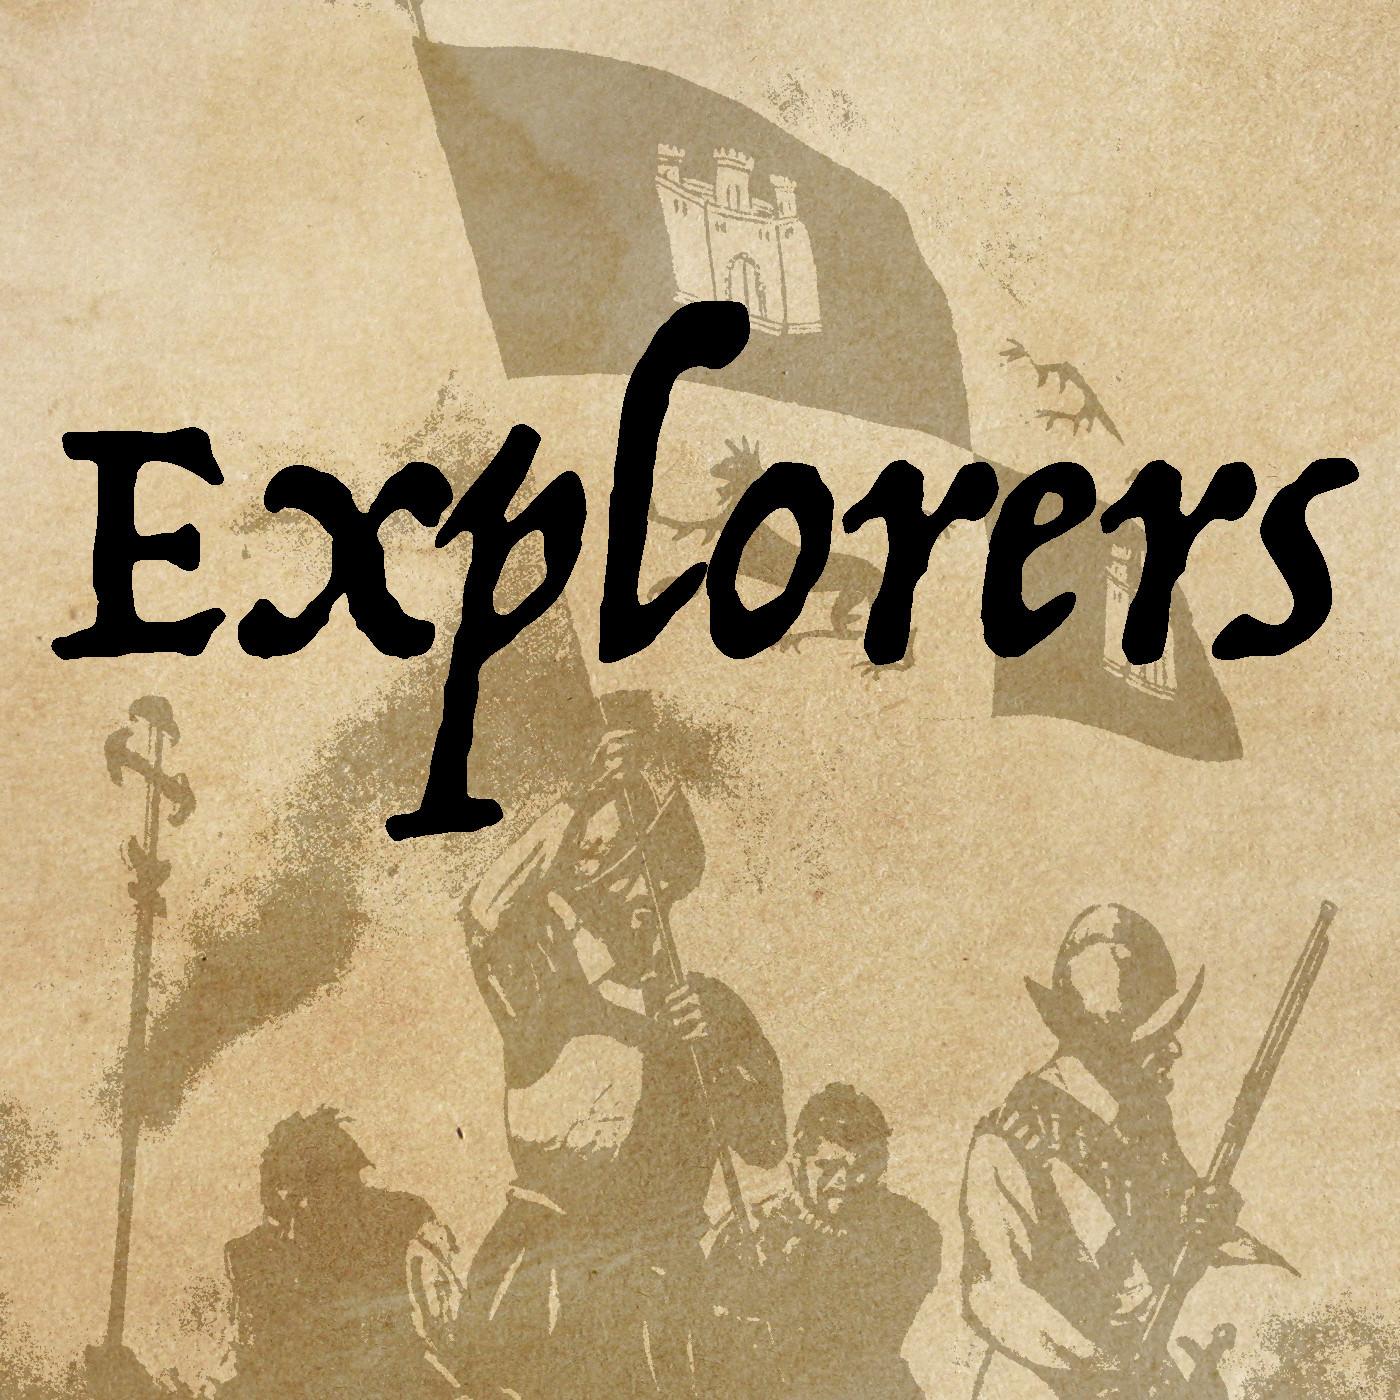 Christopher Columbus - Part 3